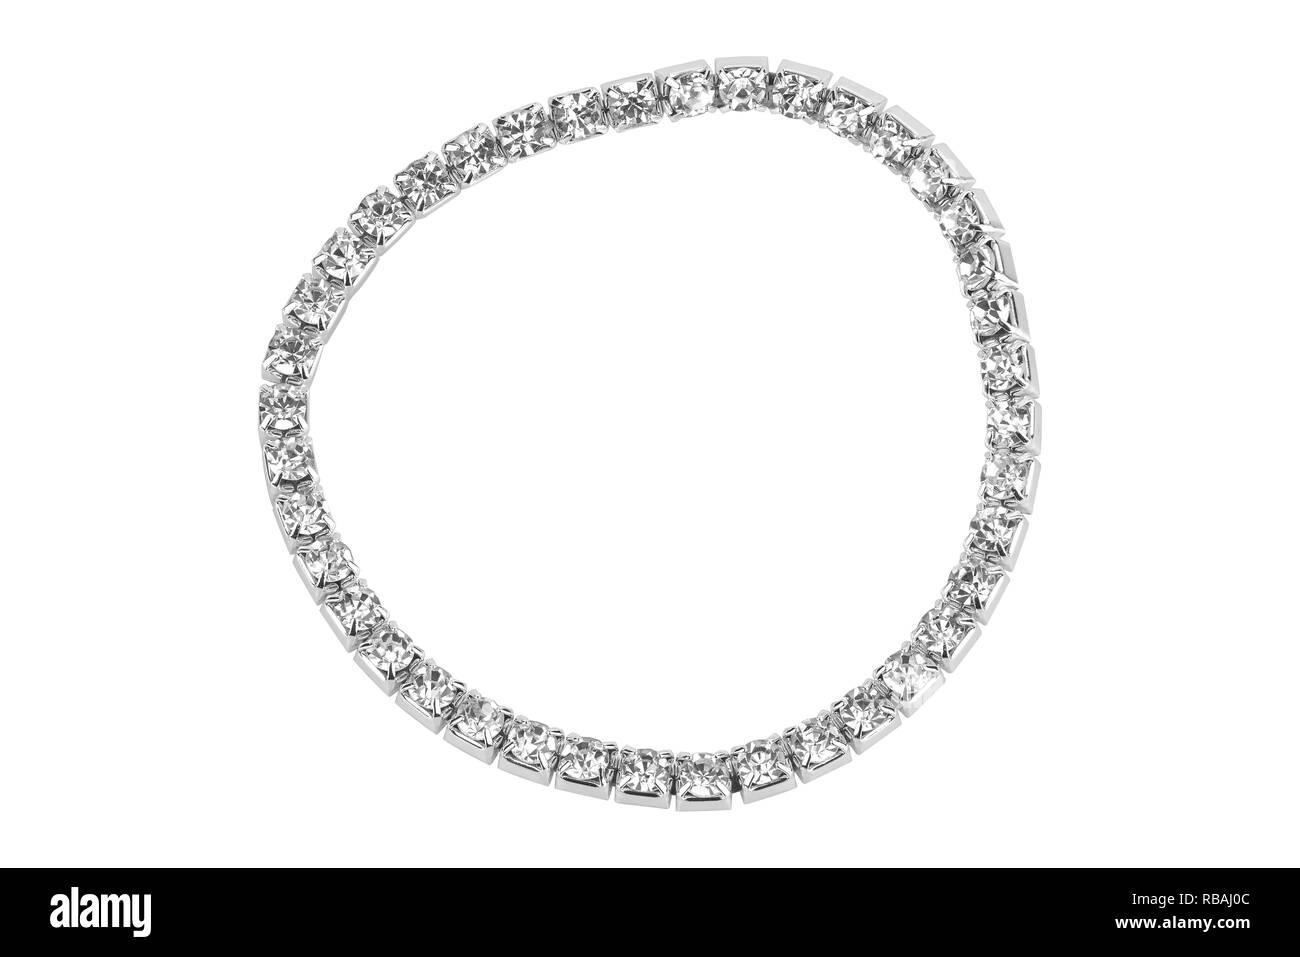 Elastic metallic bracelet with semiprecious stones, isolated on white background - Stock Image